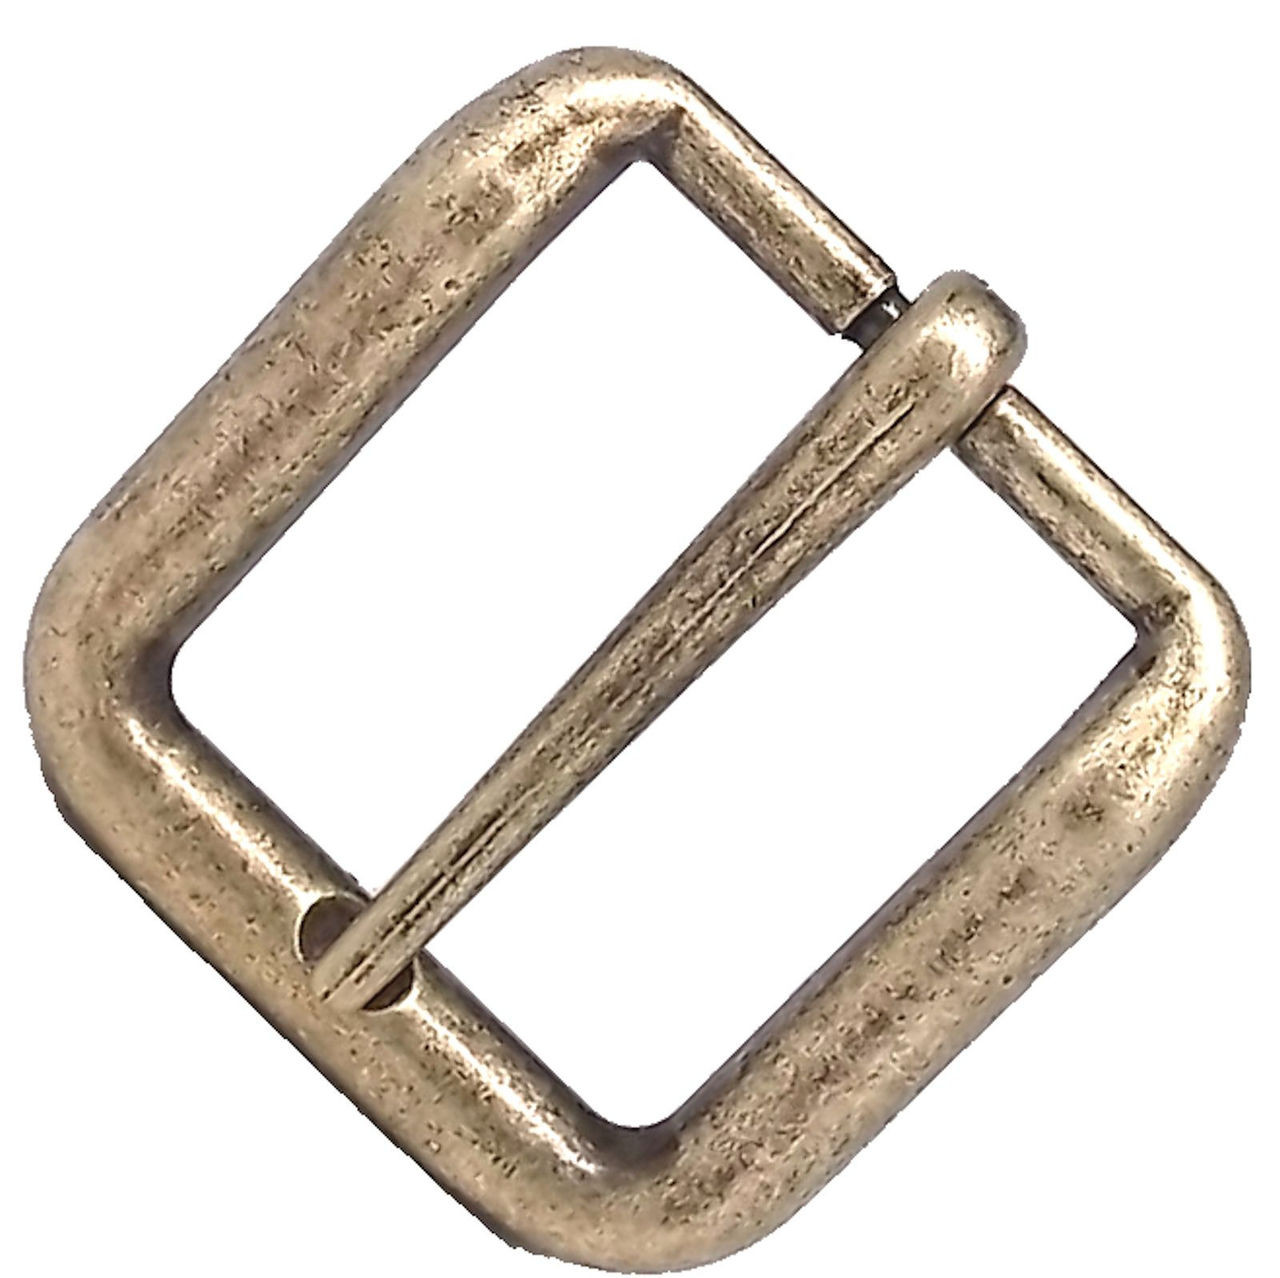 "Wave Belt Buckle Antique Brass 1-1/2"" 1641-09"